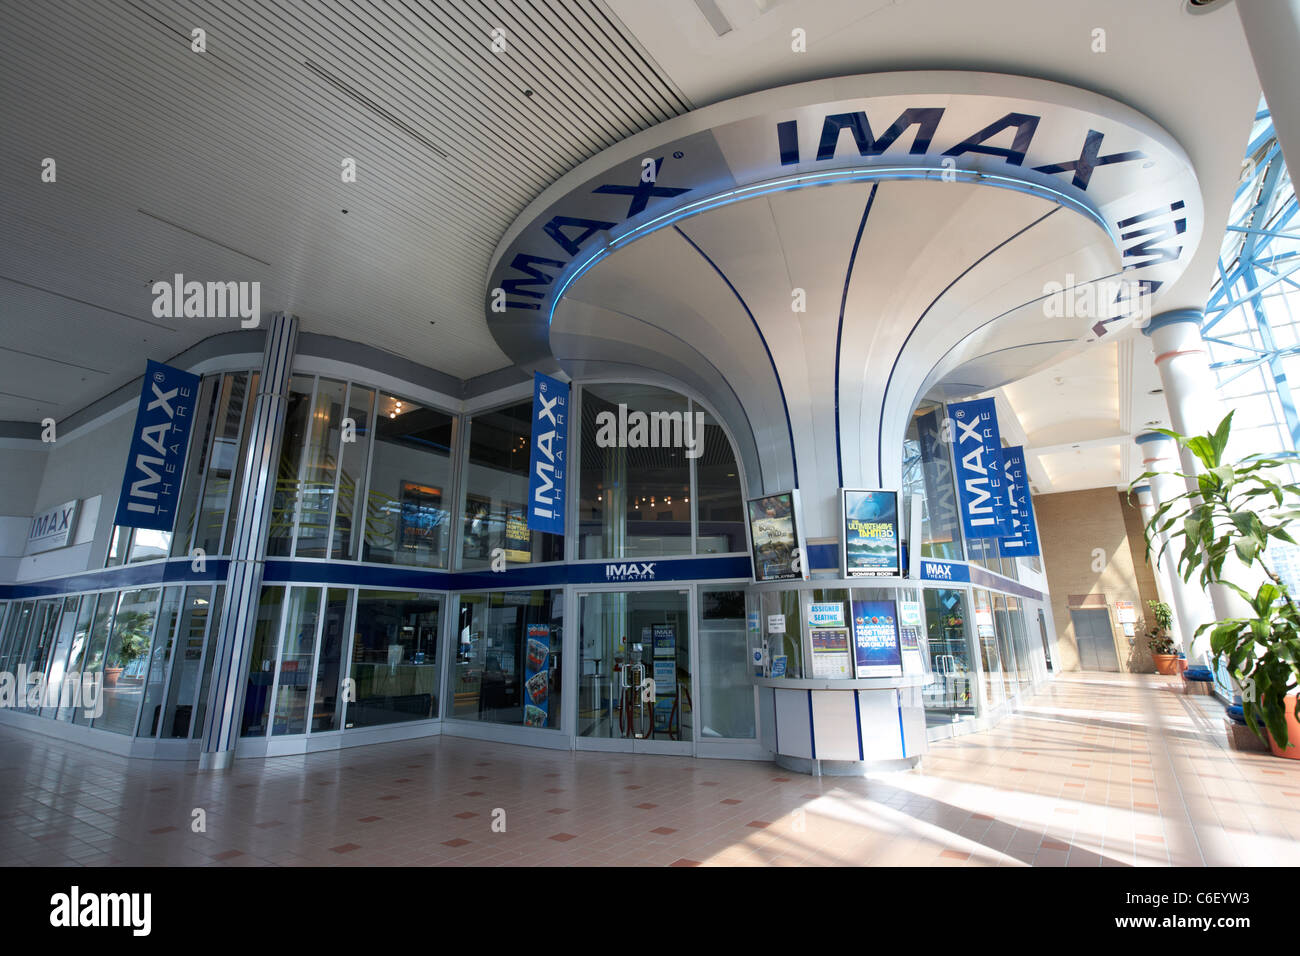 Cinéma Imax à portage place shopping center mall Winnipeg Manitoba canada Photo Stock